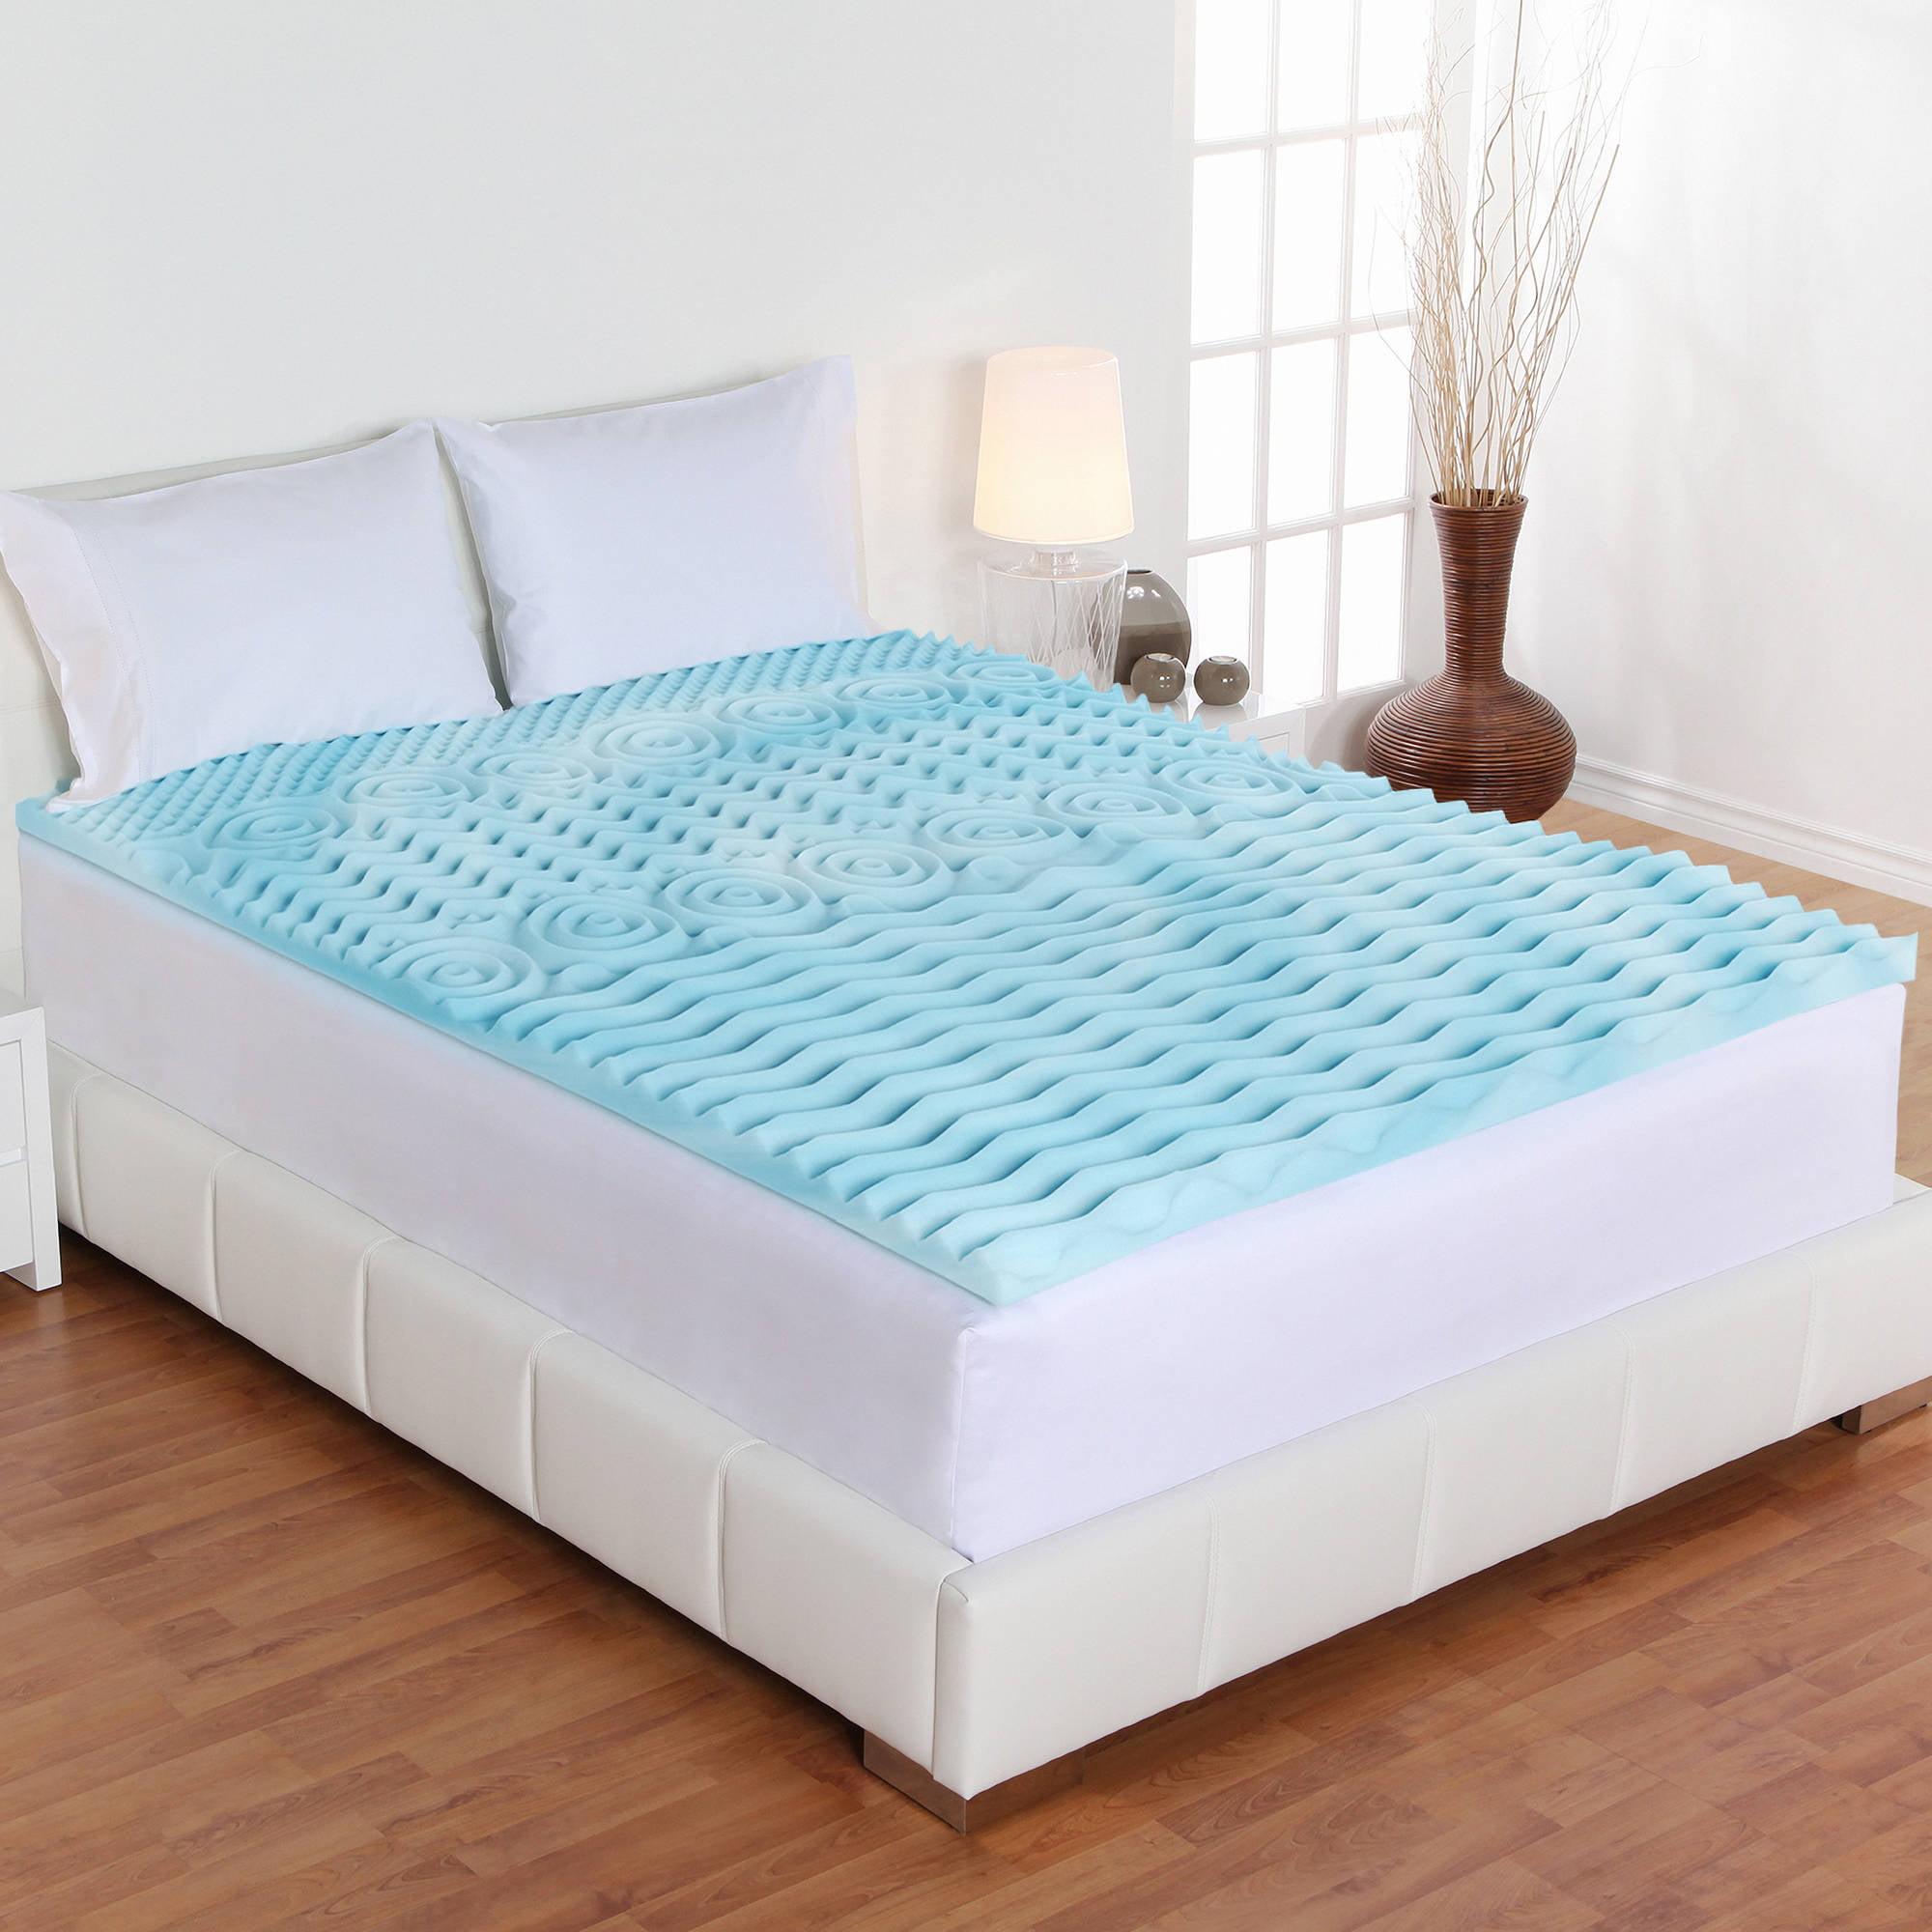 Authentic Comfort 2-Inch Orthopedic 5-Zone Foam Mattress Topper